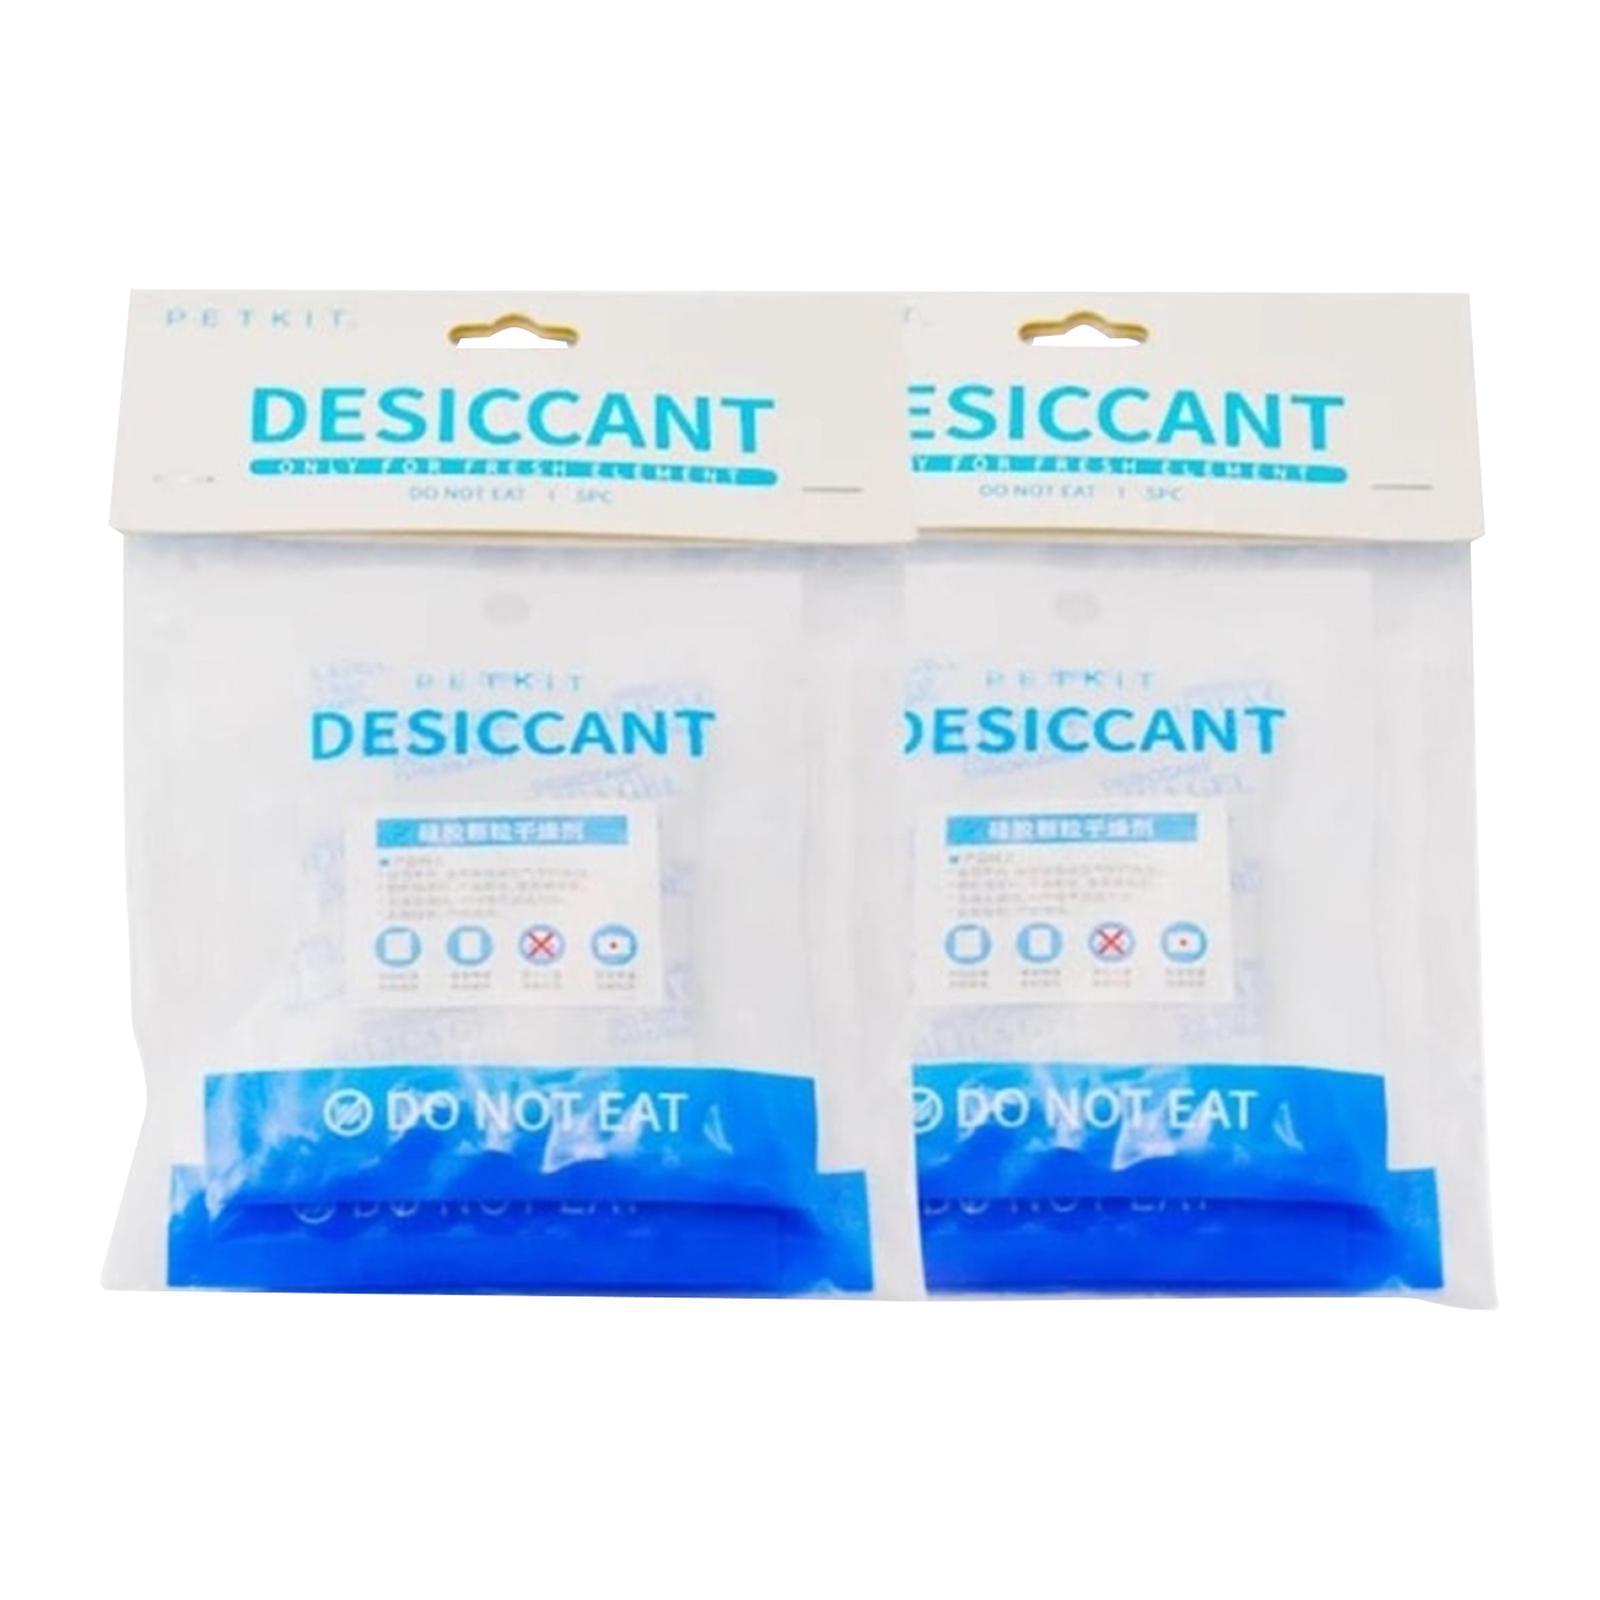 PETKIT Fresh Element / Pet Smart Feeder Desiccant - Case